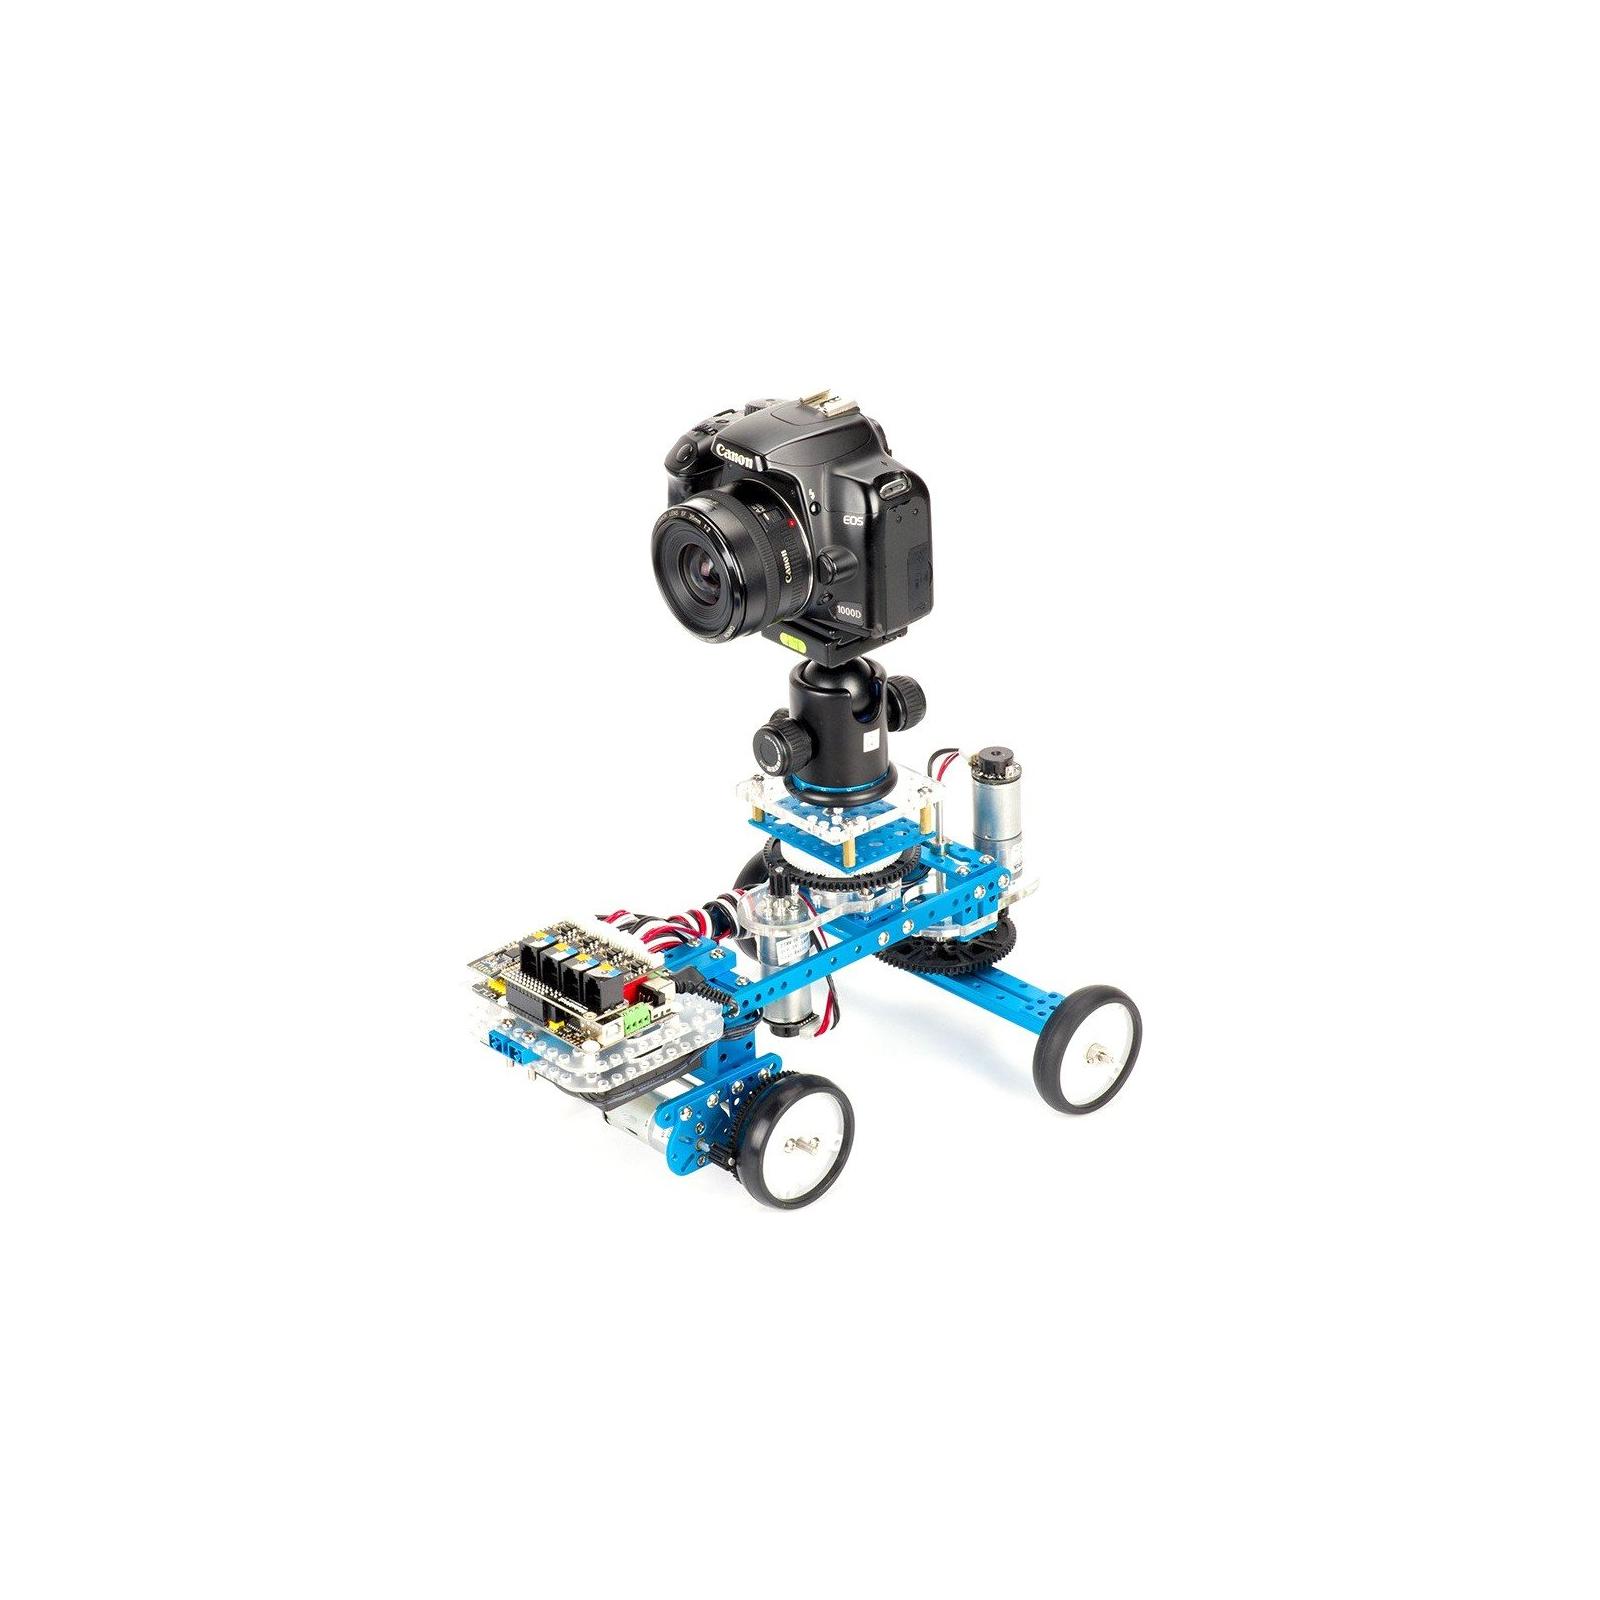 Робот Makeblock Ultimate v2.0 Robot Kit (09.00.40) изображение 7